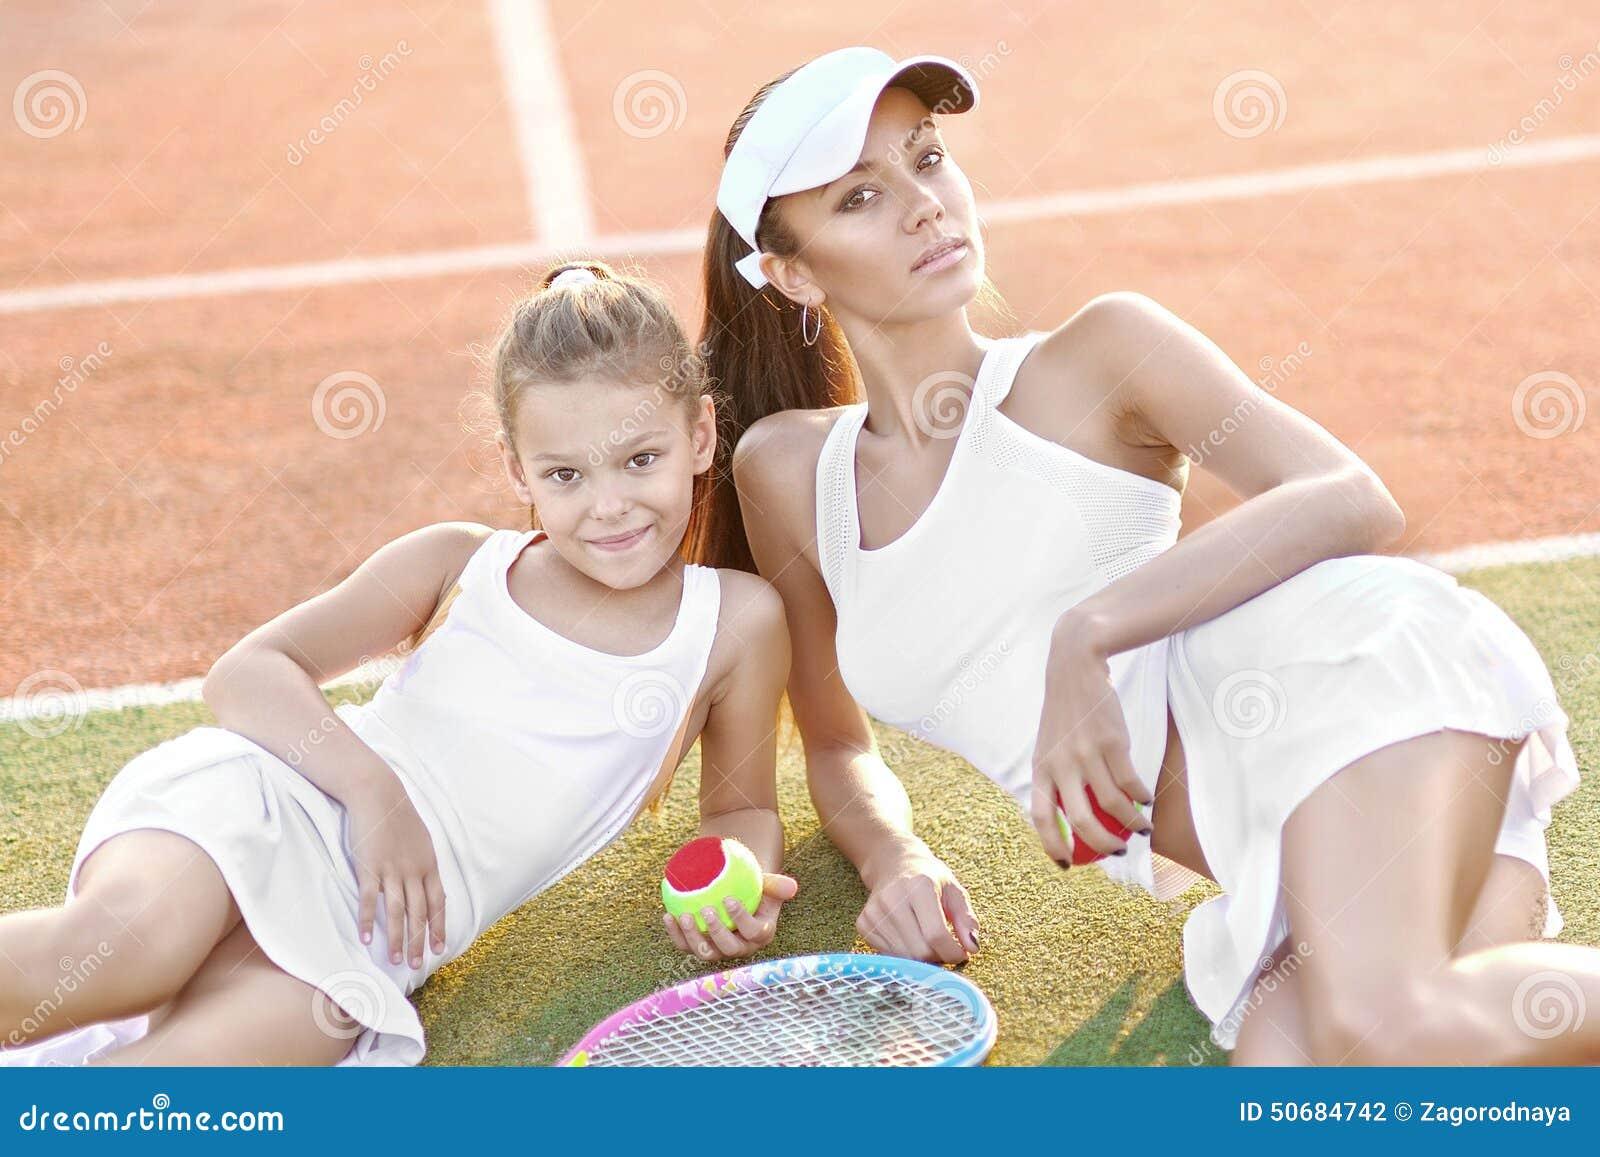 Download 母亲和女儿纵向 库存照片. 图片 包括有 女演员, 体育运动, beauvoir, 女儿, 事故, 健身 - 50684742